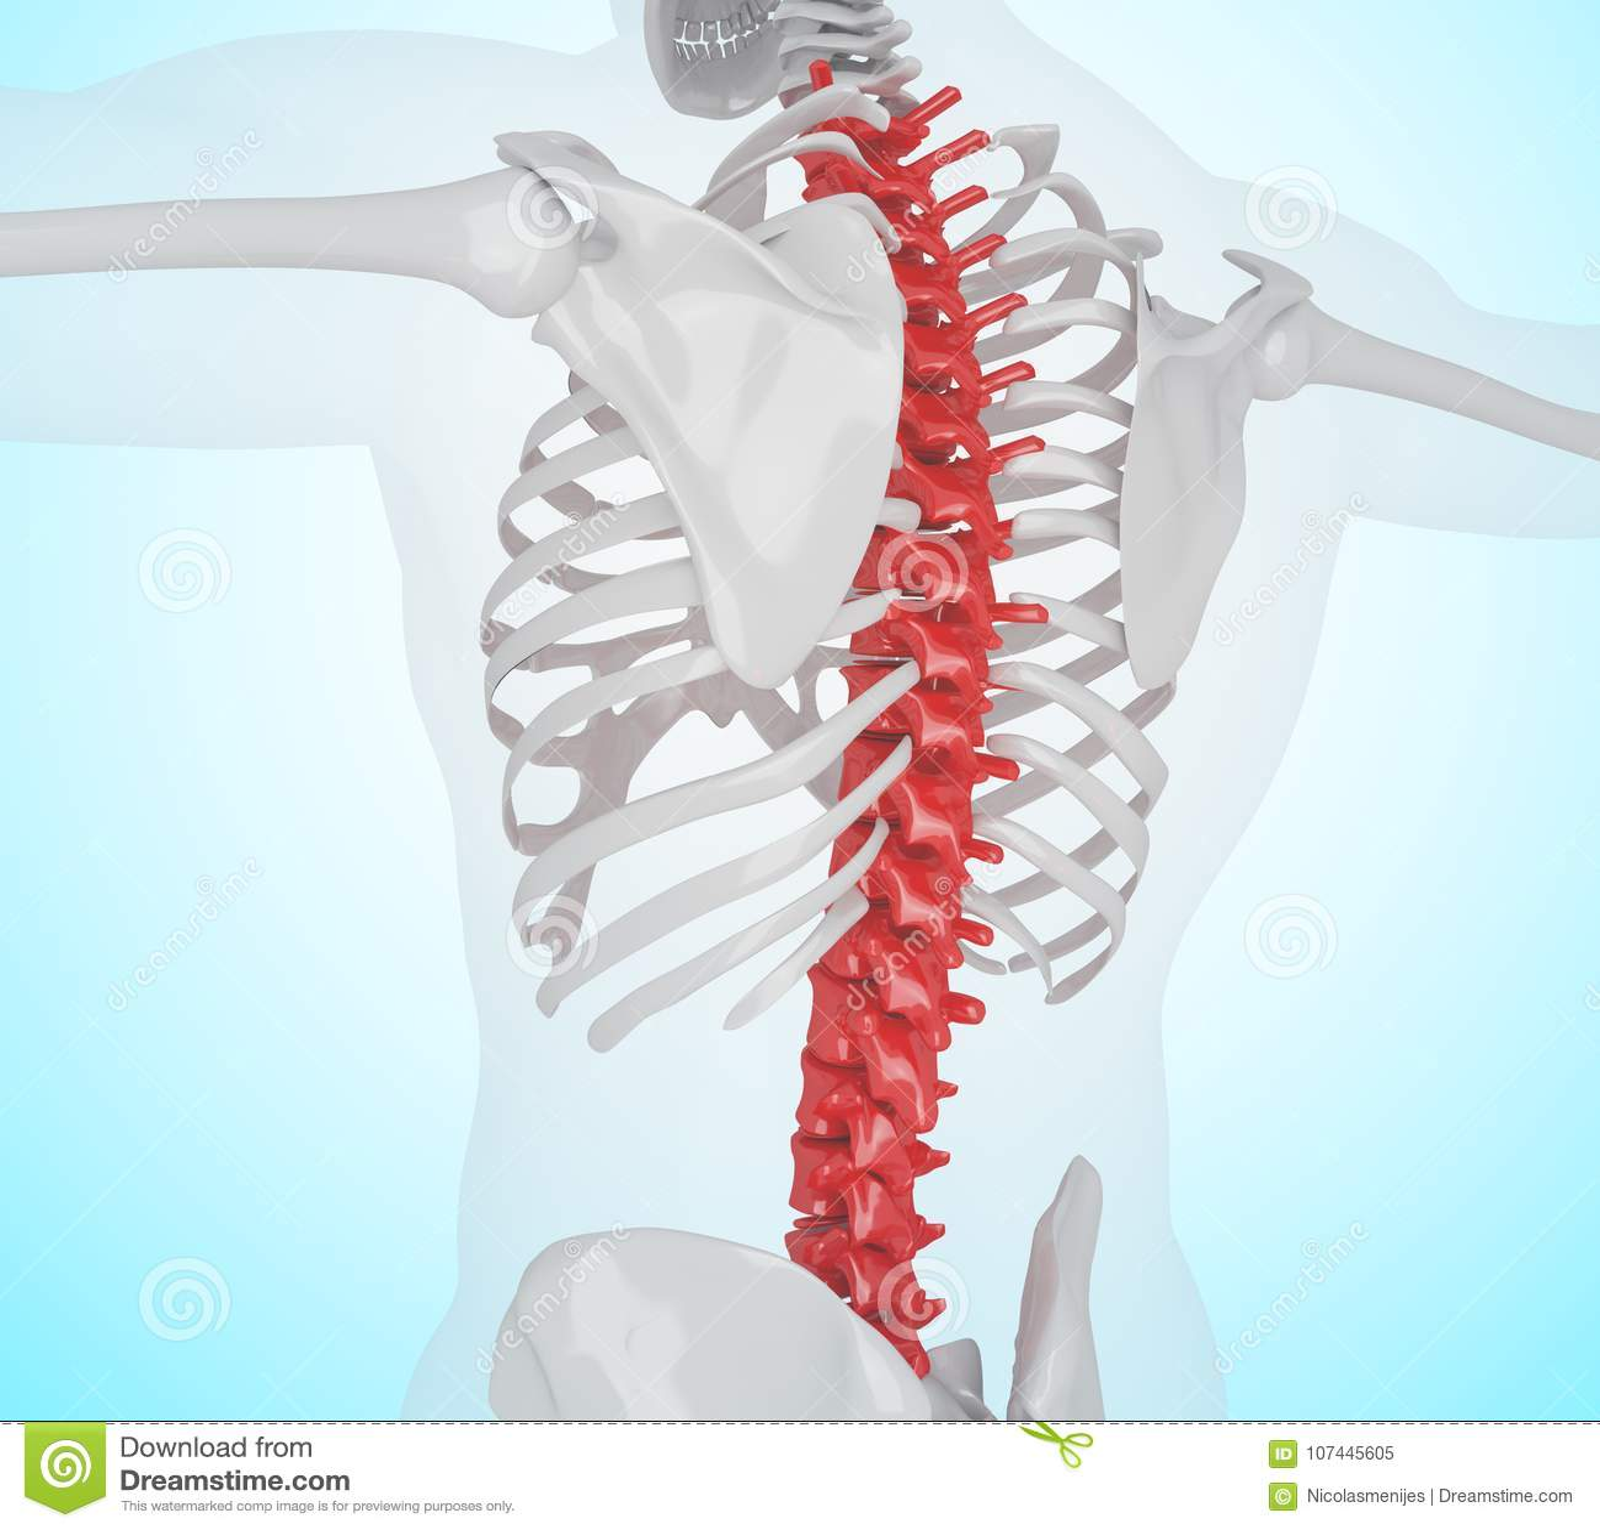 3d Illustration Of Human Skeleton Back Pain Stock Illustration